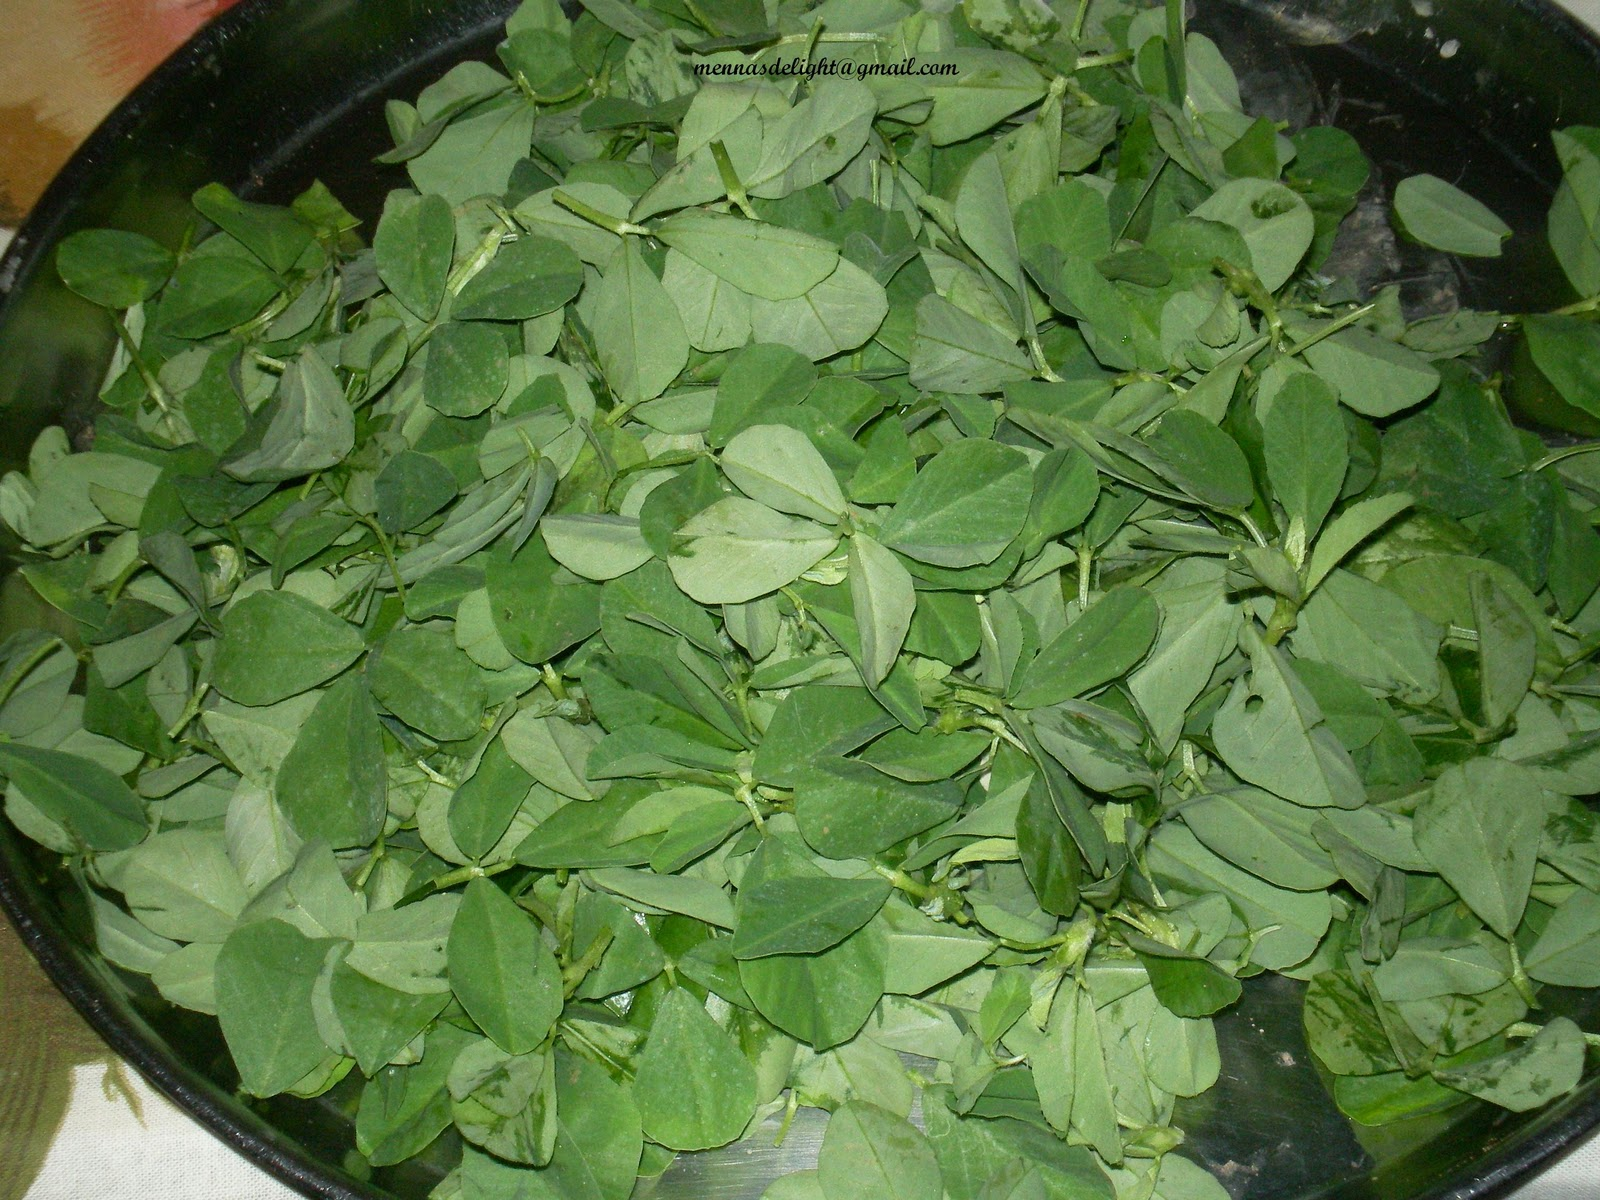 ... Bangalore - Life n Spice: Aloo Methi / Potatoes with Fenugreek leaves